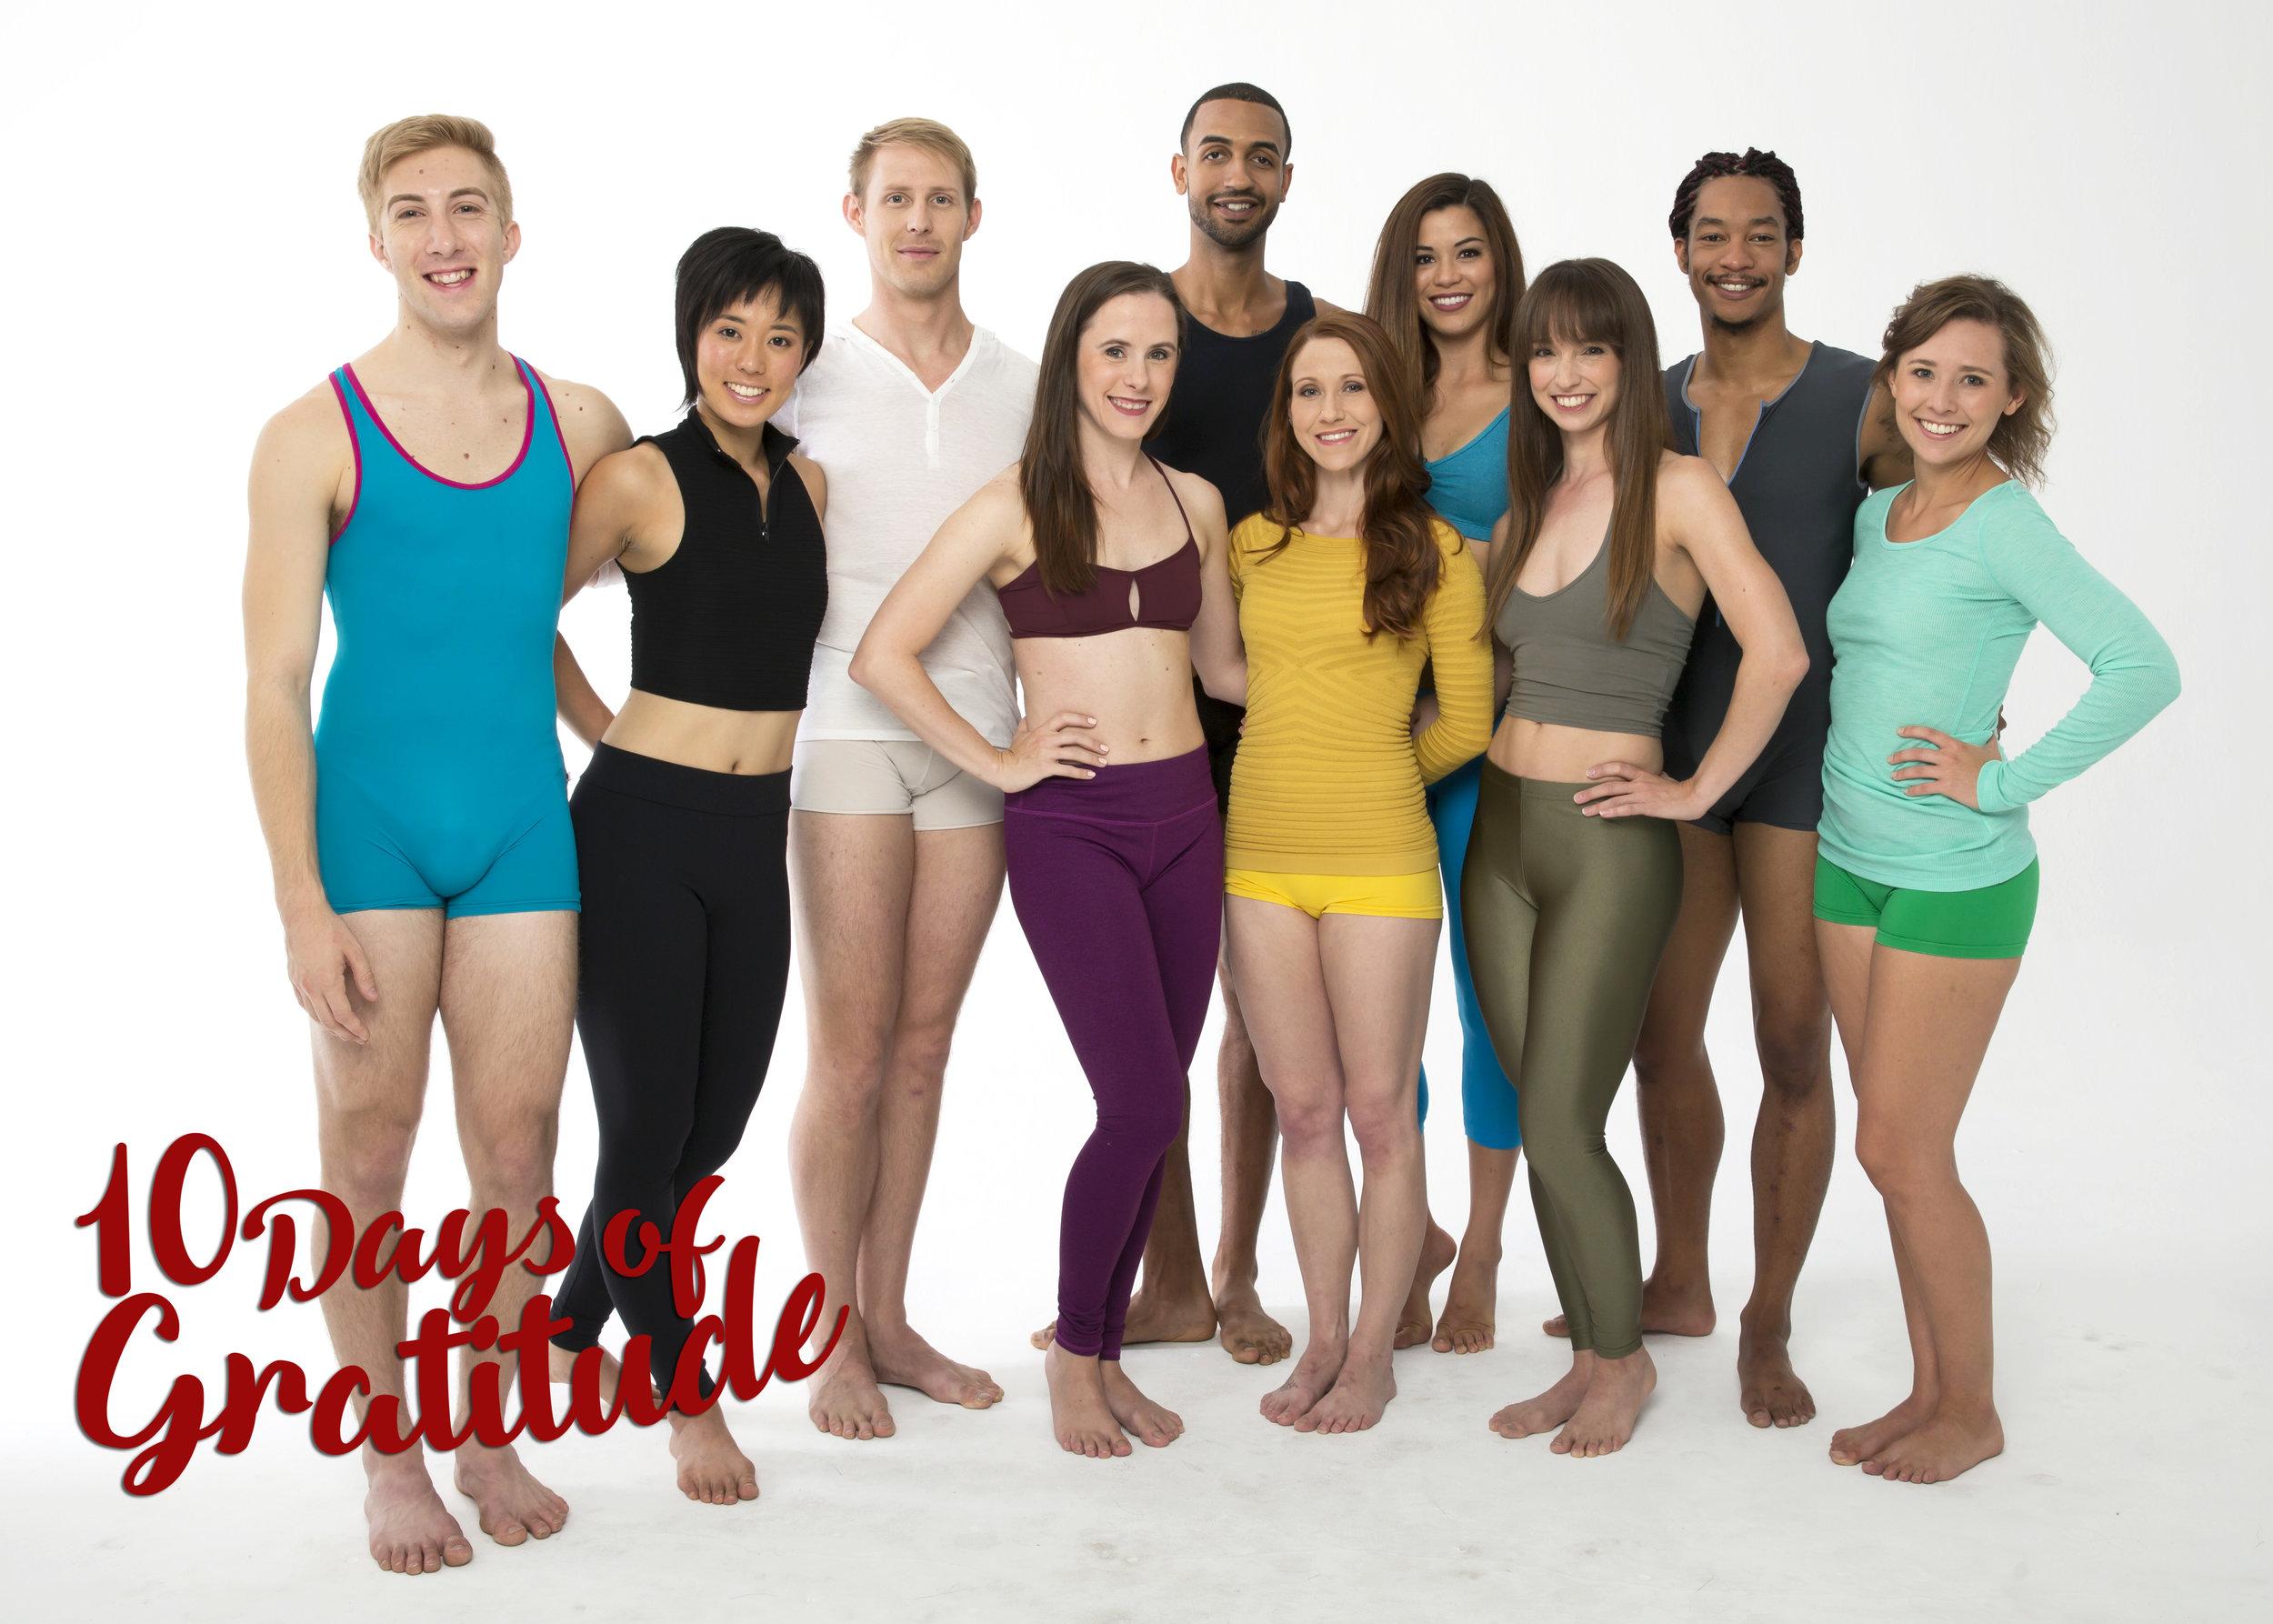 #BDSeason14 Dancers (L to R): Sammy DeAngelo (apprentice), Chihiro Sano, Evan Swenson, Amanda Kay White, Joshua King, Kaitlin Regan, Amie Lee Kilgore, Toshiro Abbley & Katie Natwick (apprentice).